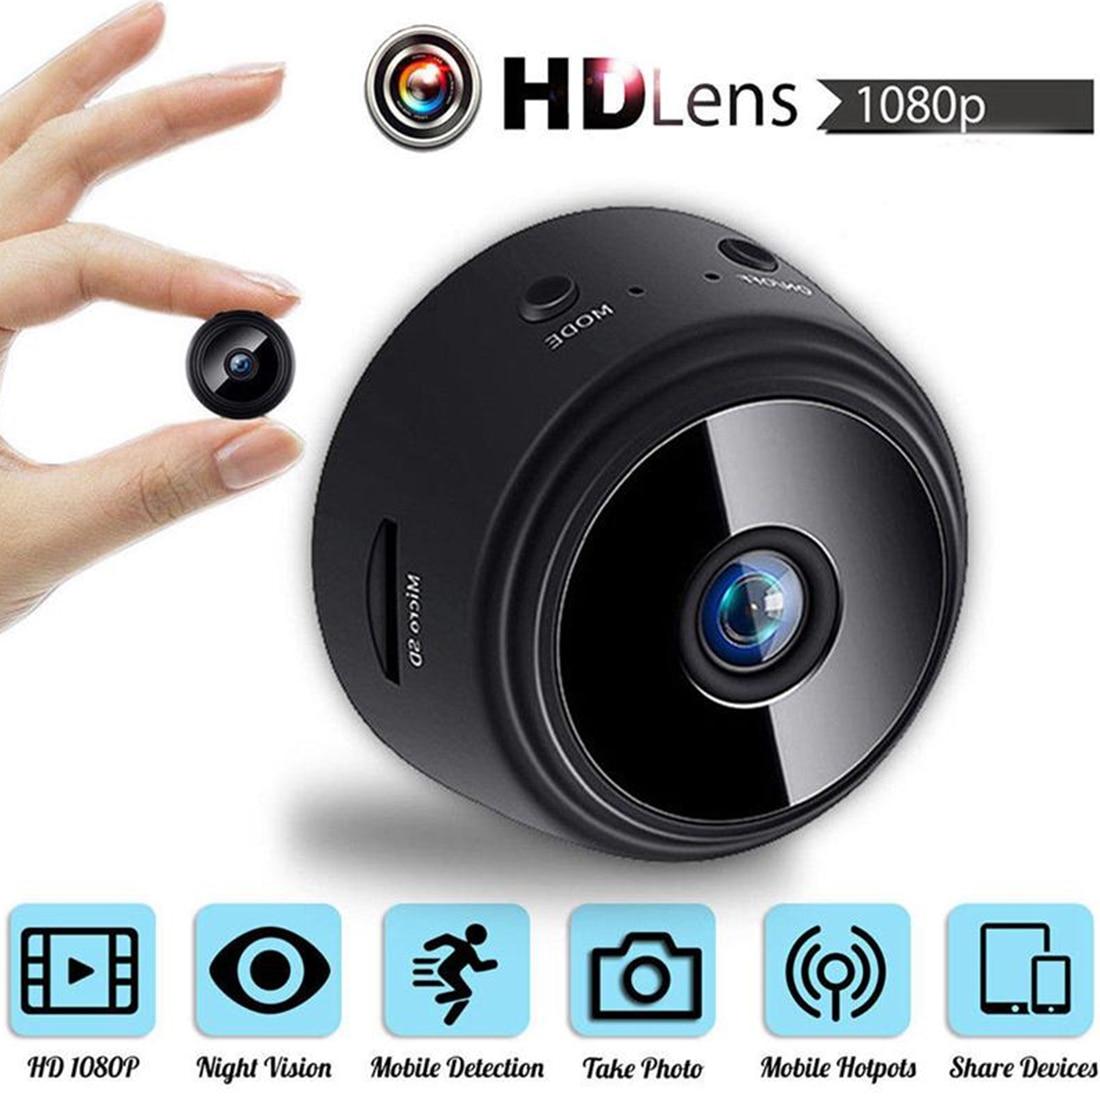 A9 1080P Wifi Mini Camera Home Security P2P Camera WiFi Night Vision Wireless Surveillance Camera Remote Monitor Phone App